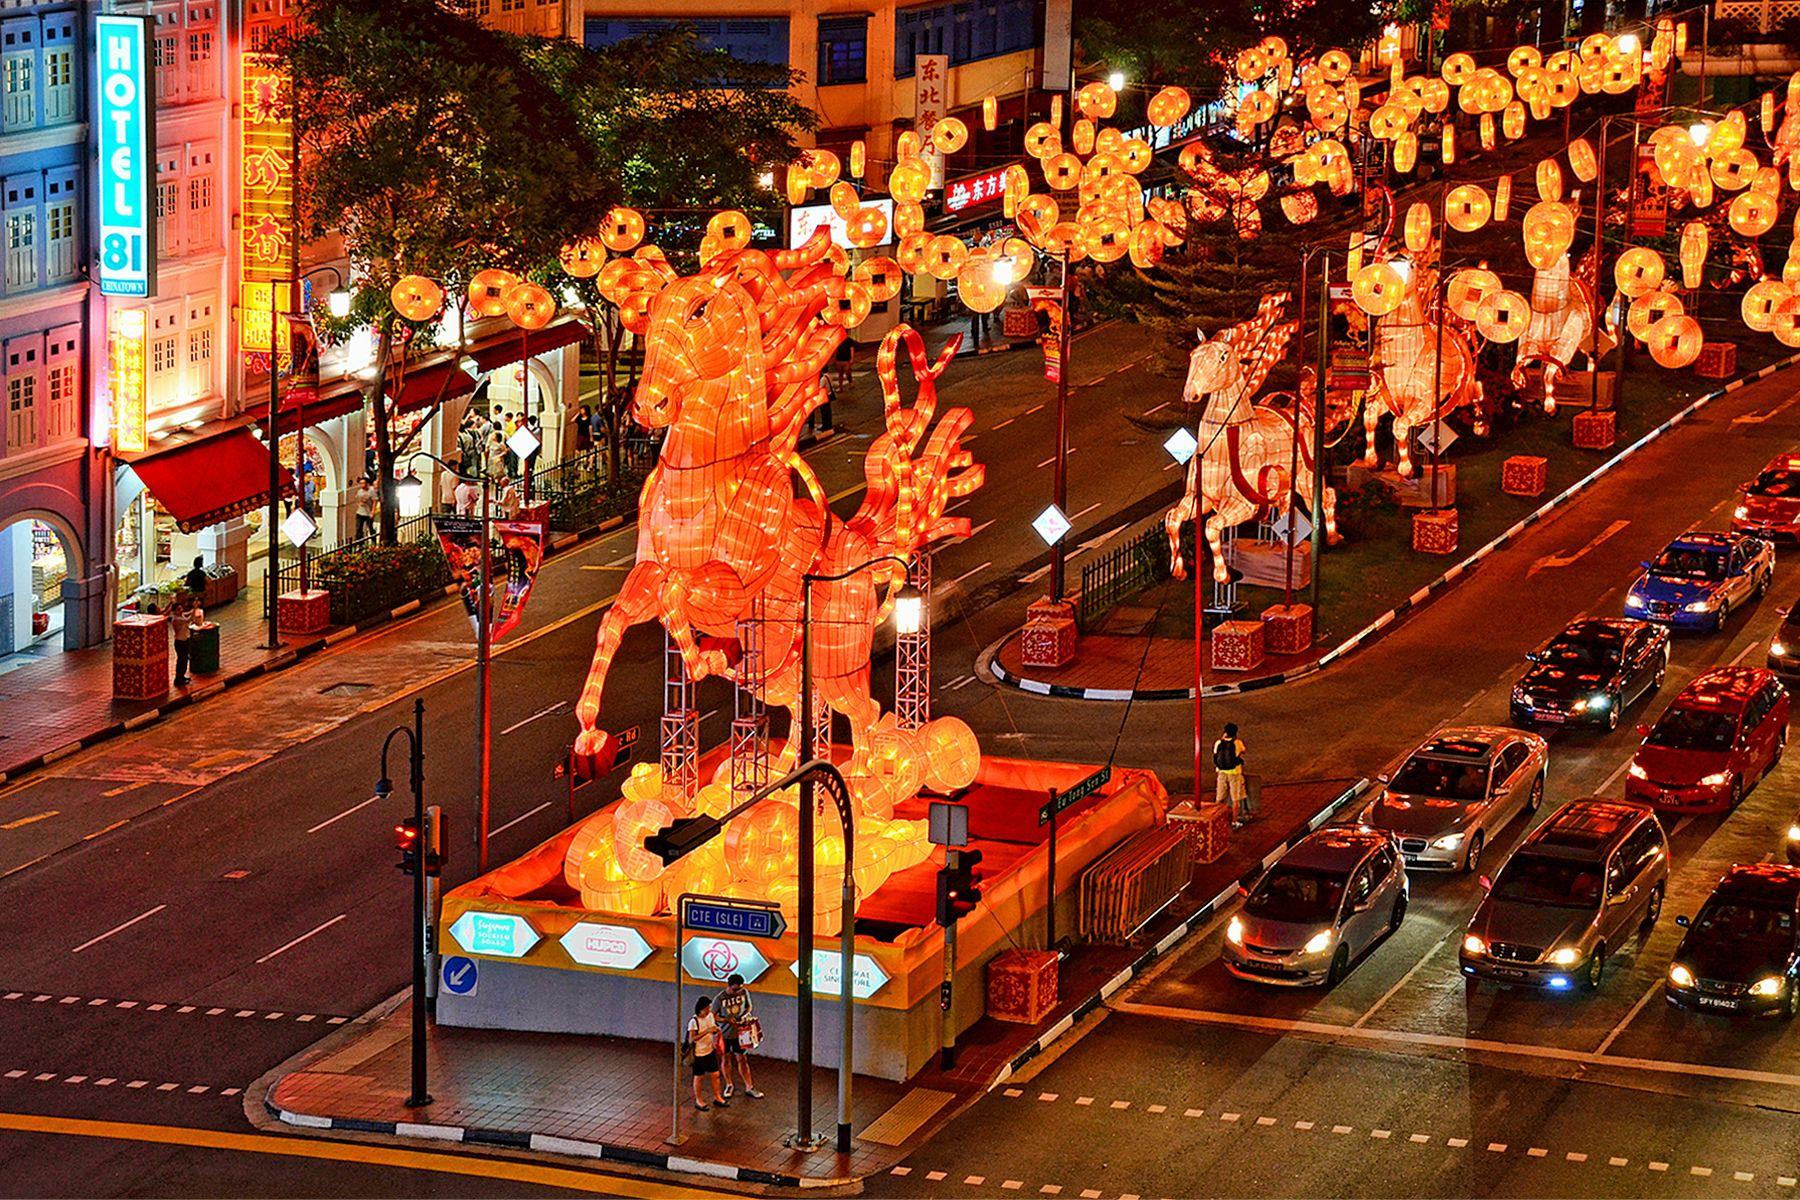 Chinatown singapore nightlife | Places to Go | Pinterest | Singapore ...